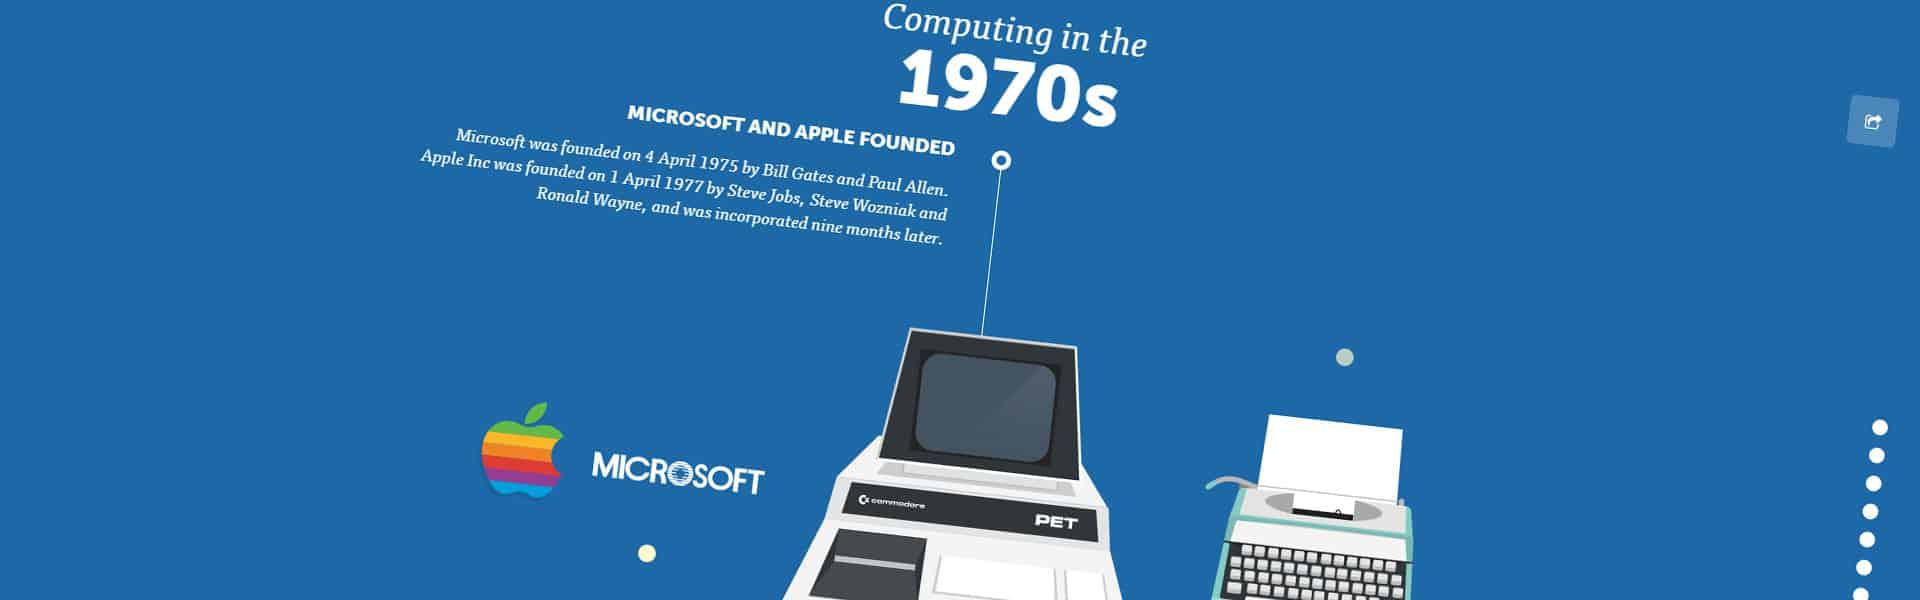 A visual history of computing infographic